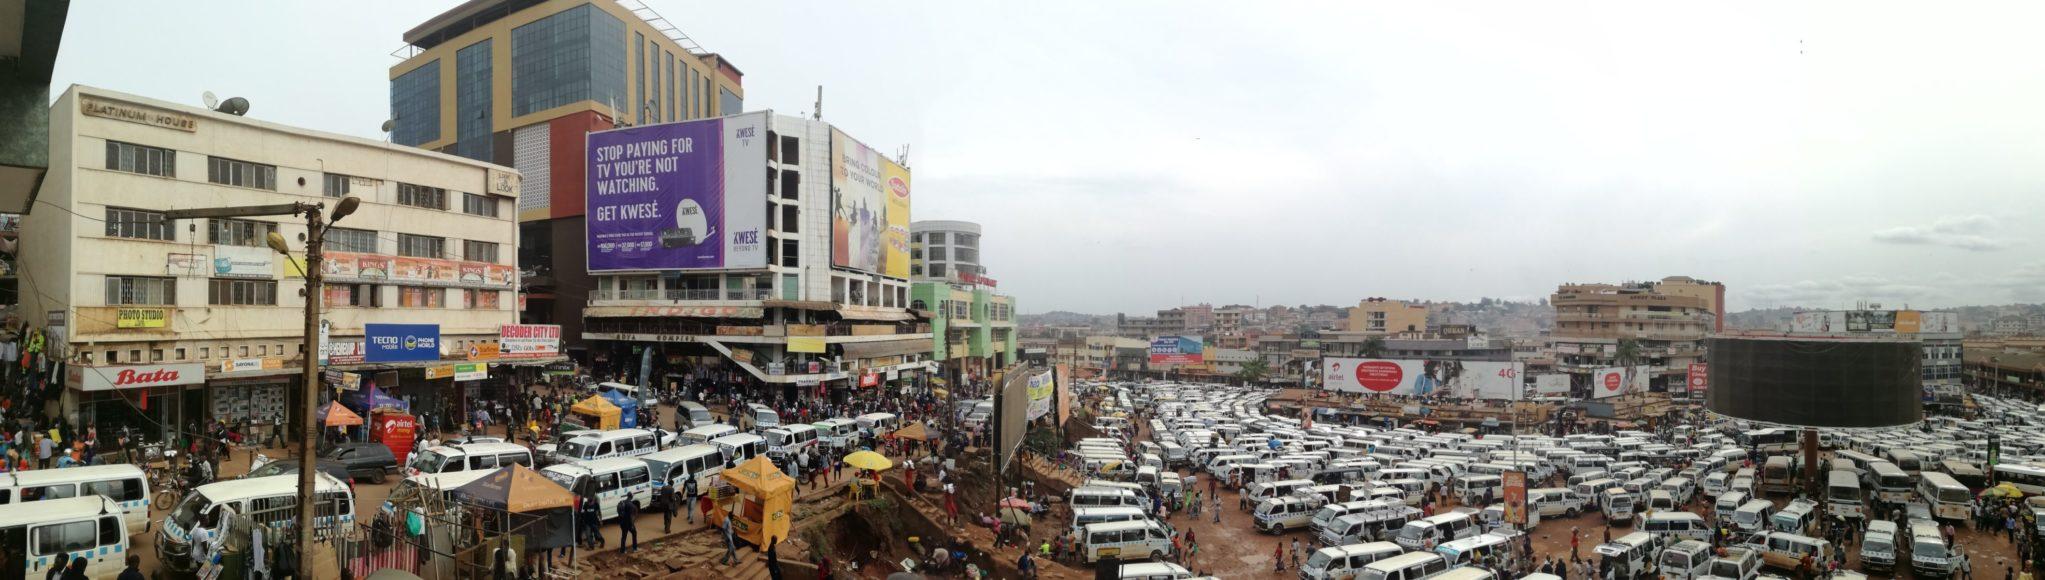 Complex politics complicate urban development